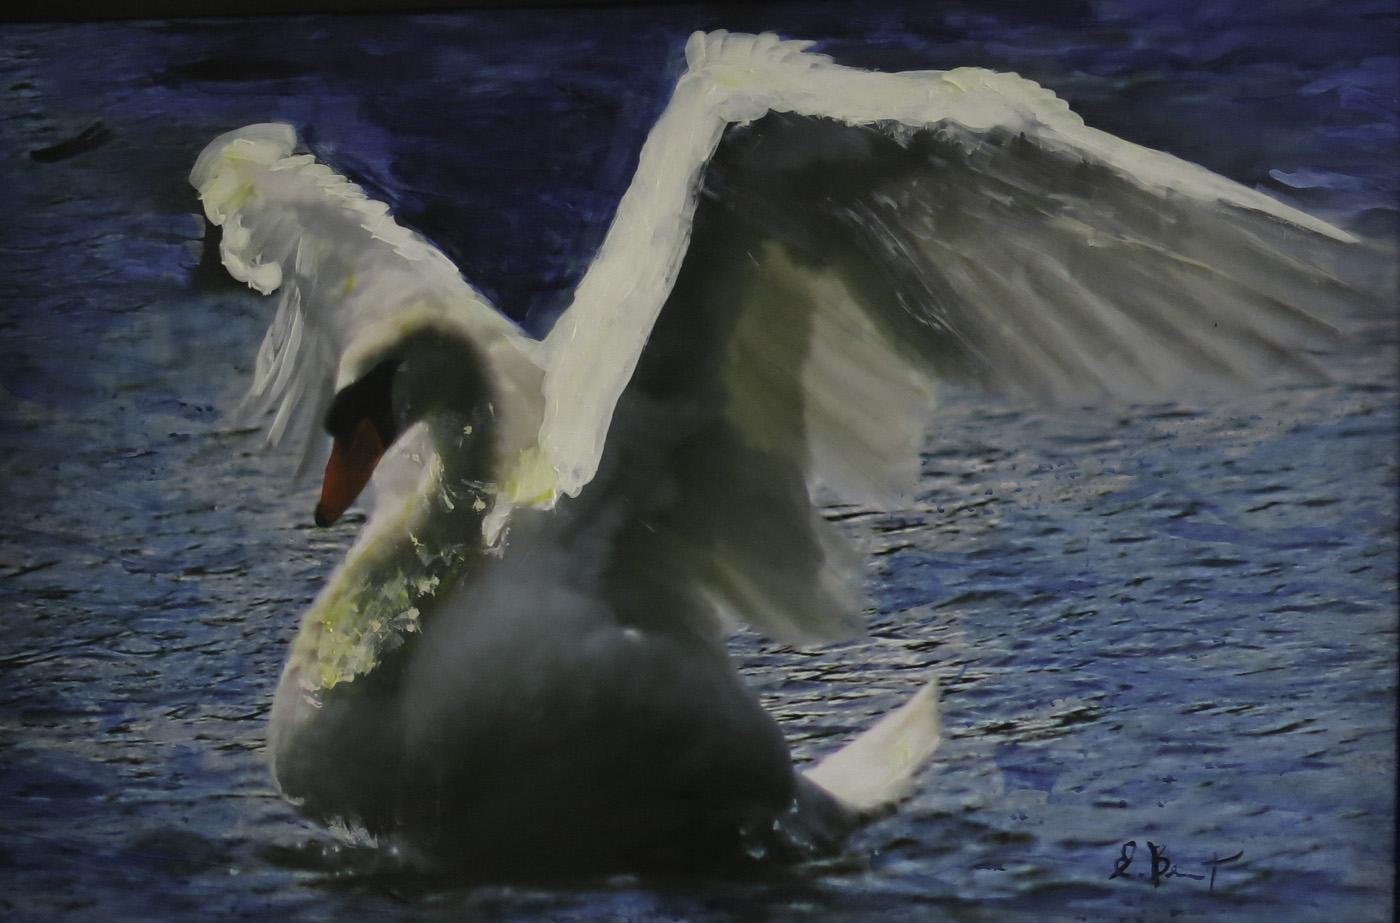 Swan dance (,ixed-media)